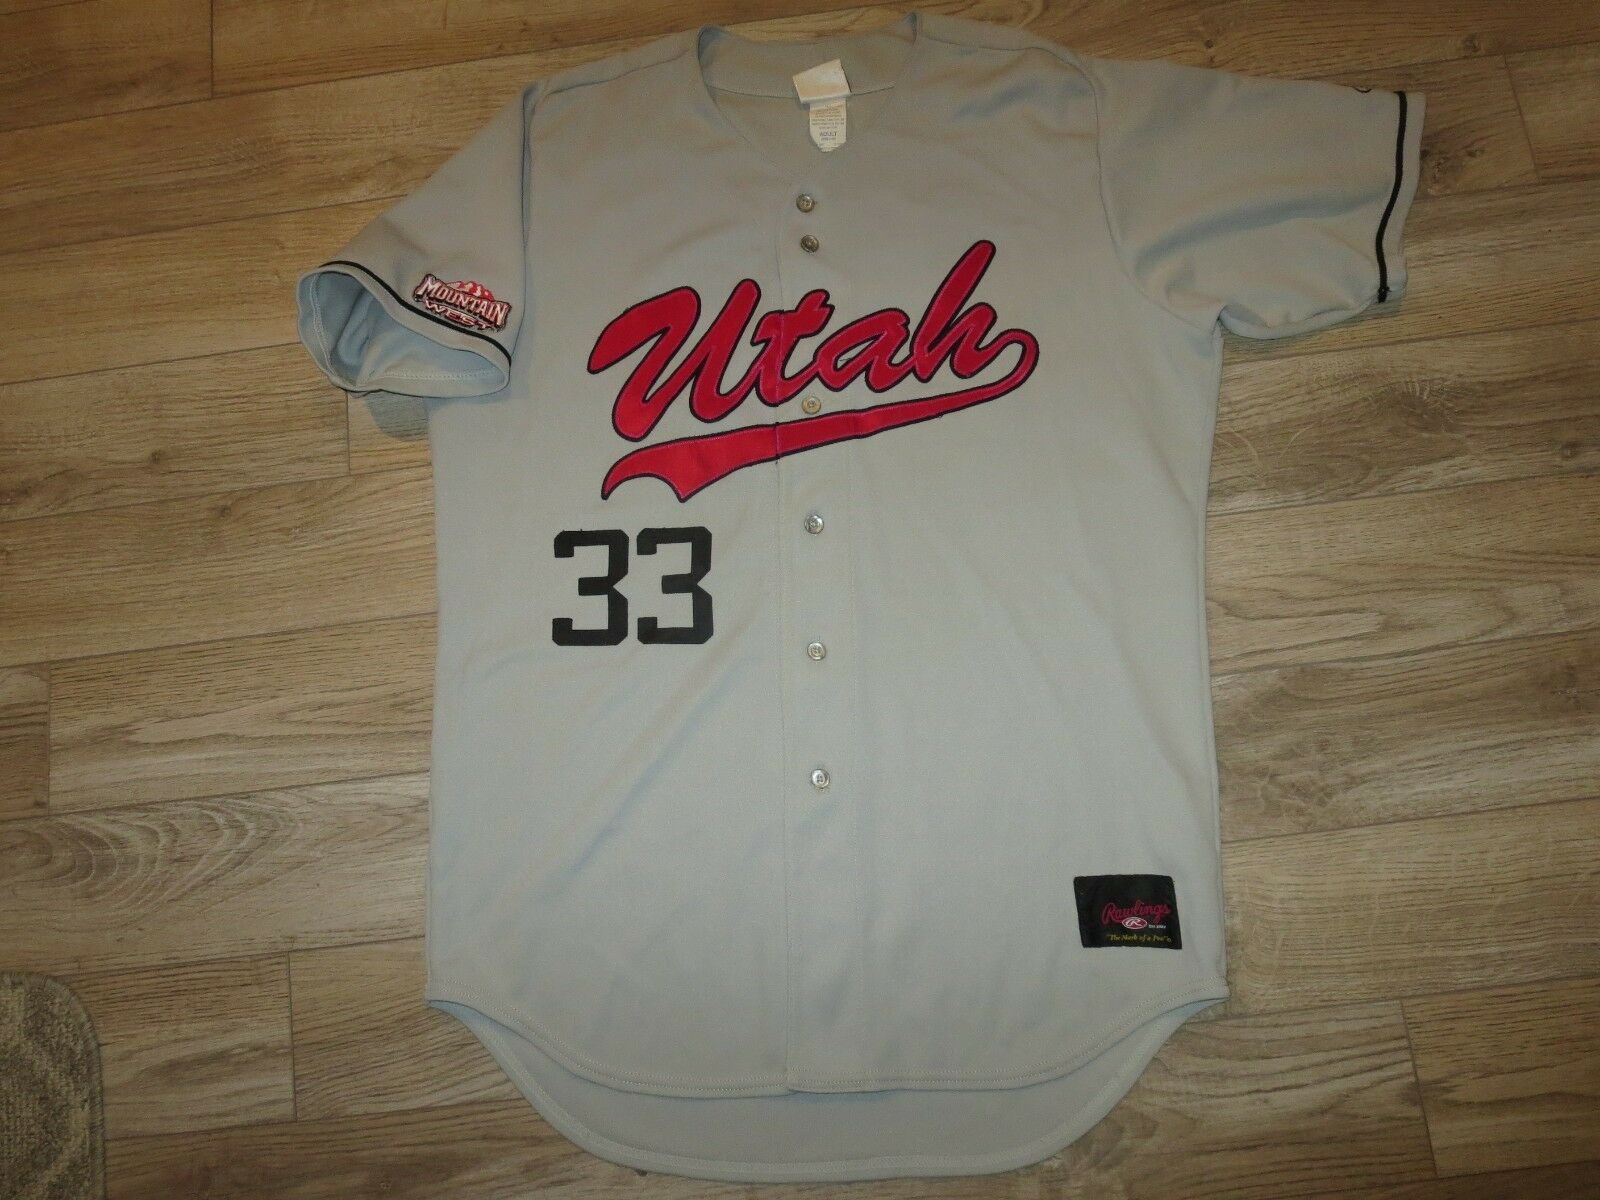 Utah Utes  33 Béisbol Team Montaña West Juego Worn Usado Rawlings Camiseta 44